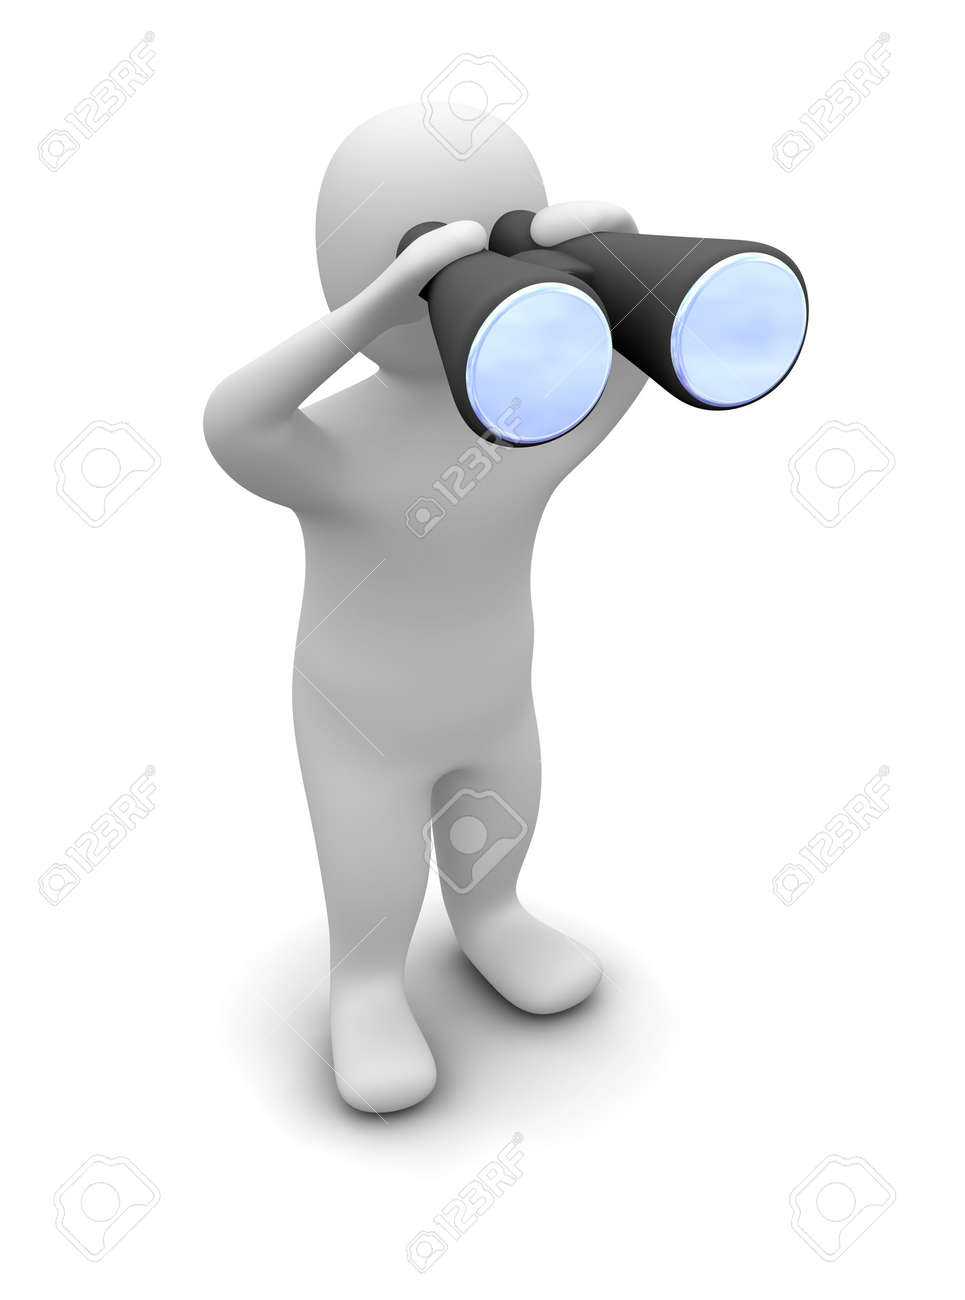 Man looking through binoculars. 3d rendered illustration. Stock Photo - 4946242